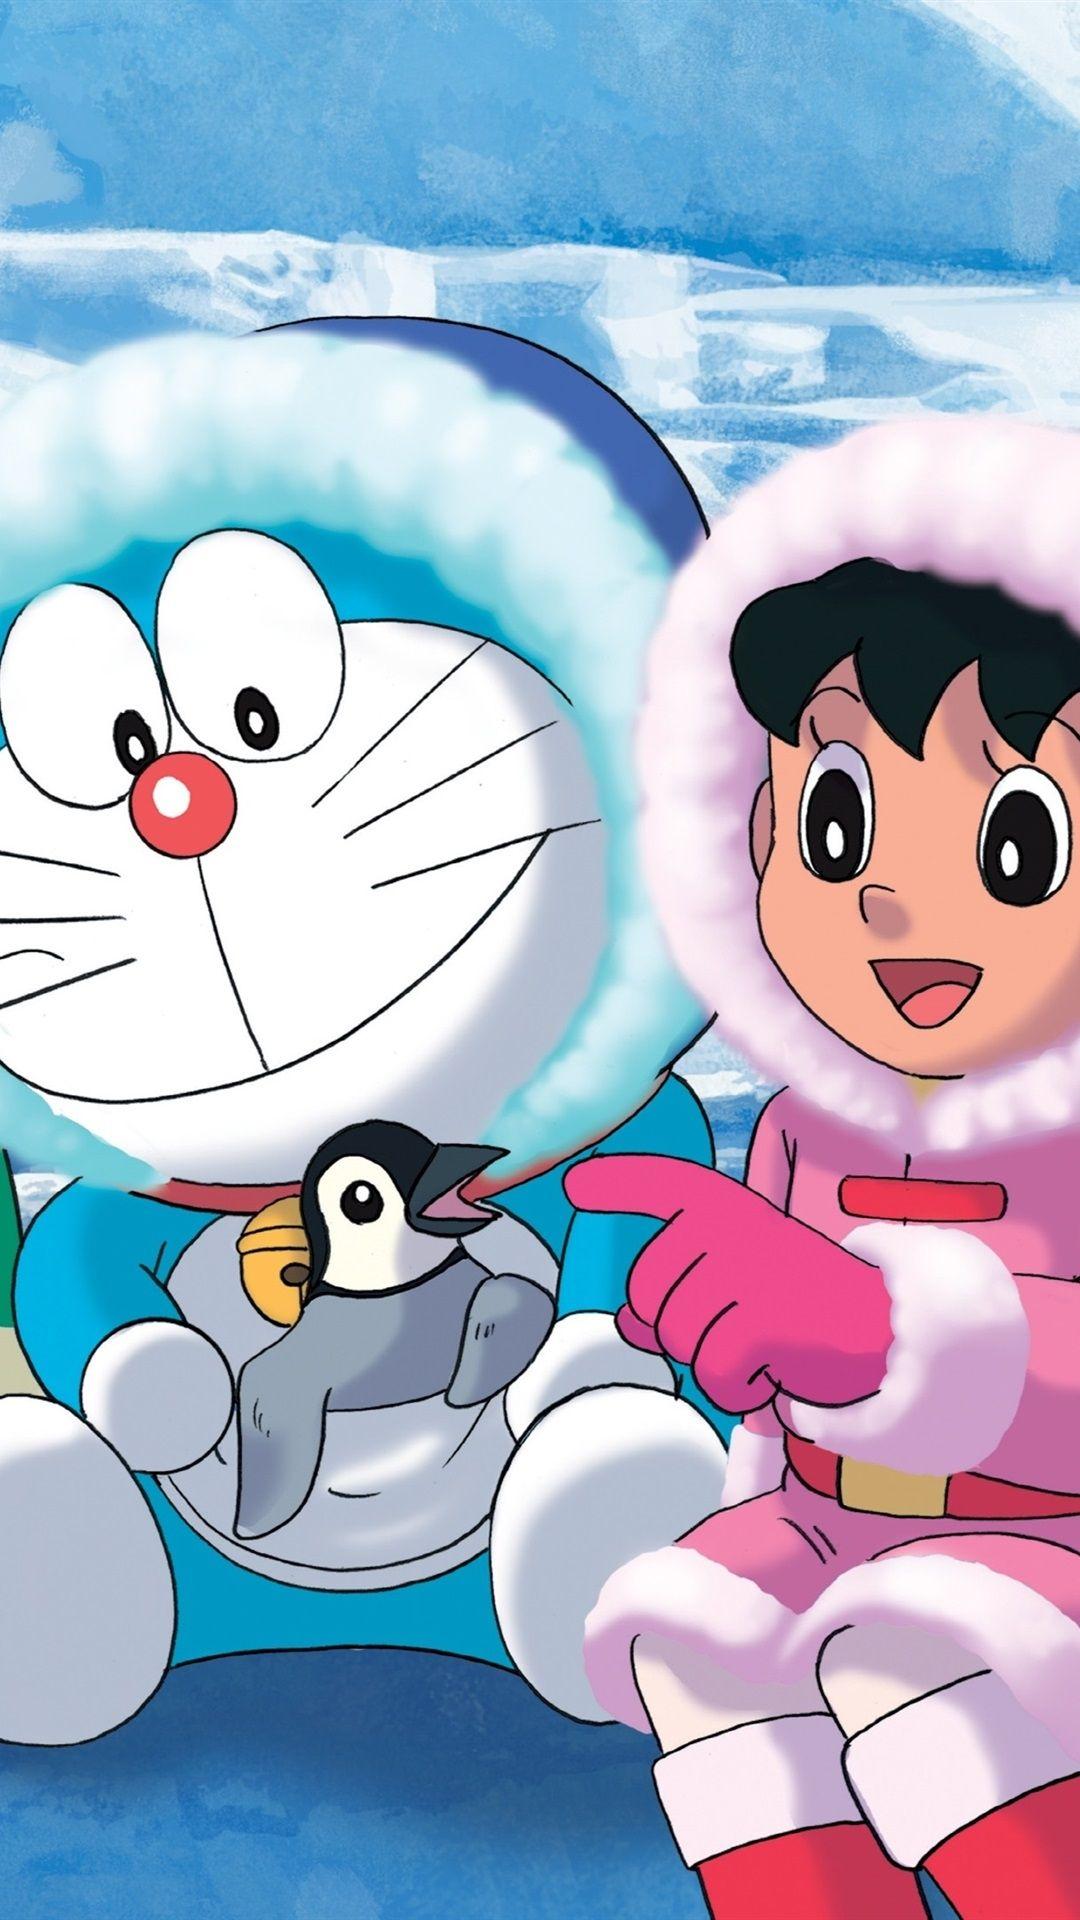 Doraemon Wallpaper Hd Android Hd Wallpapers Backgrounds With Regard To The Most Awesome Doraemon Wallpaper For Phone Di 2020 Kartun Latar Belakang Animasi Animasi